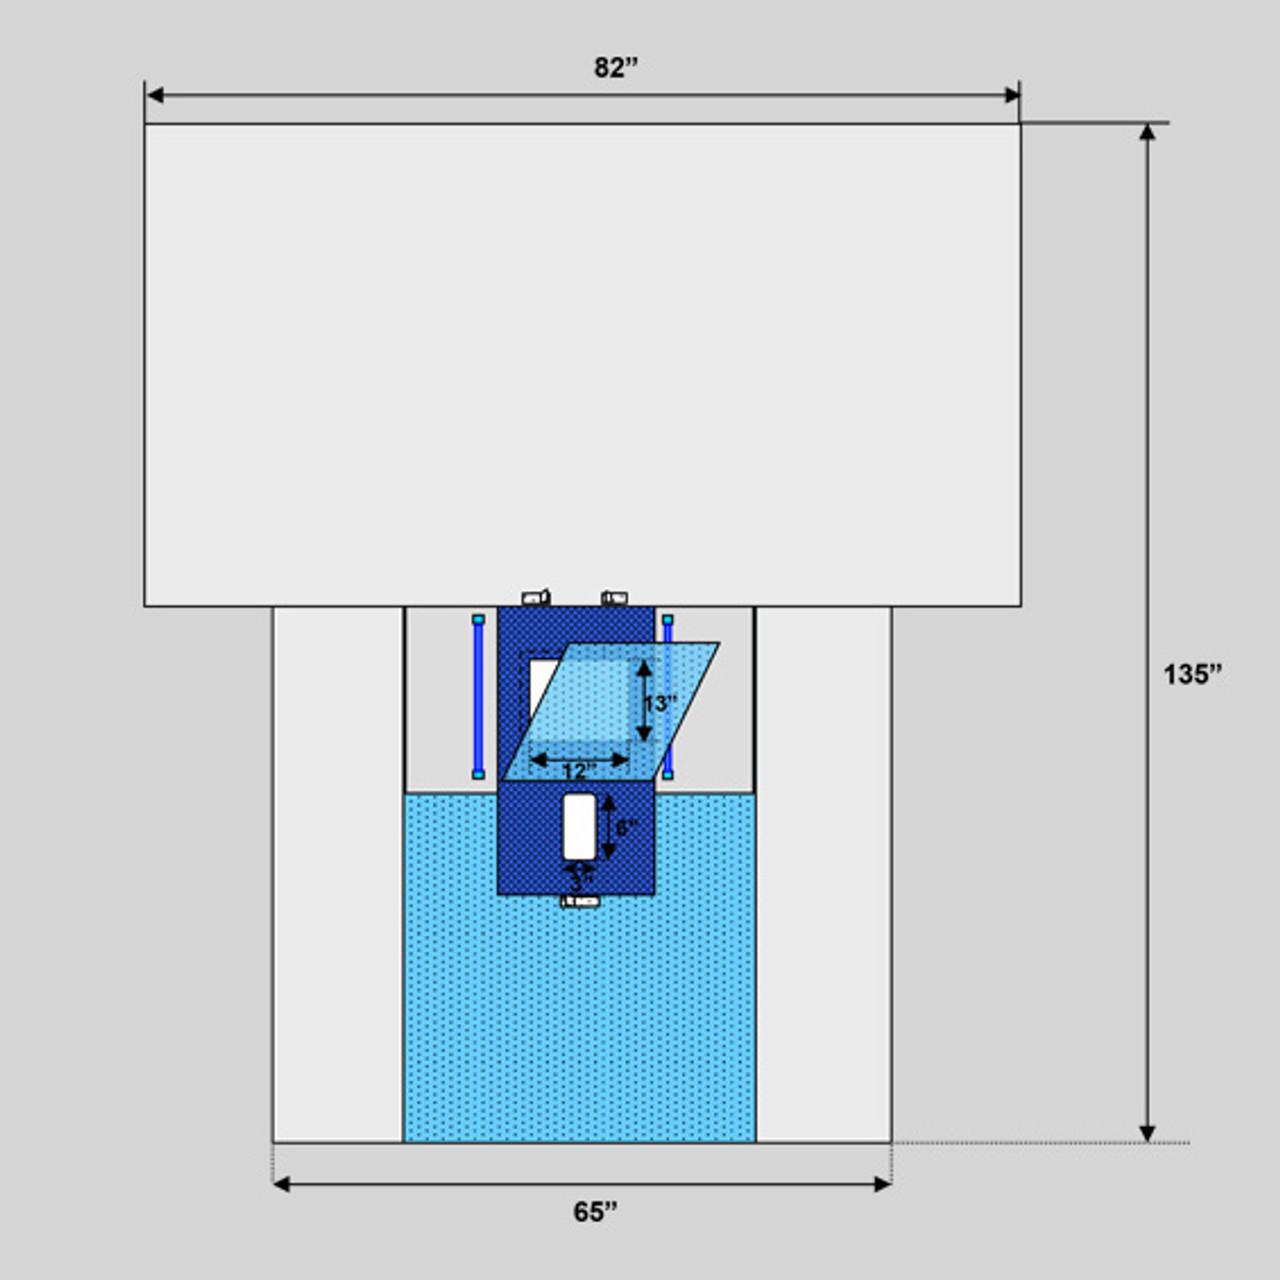 "Laparoscopic/Pelviscopy Abdominal Drape, 82"" x 135"", Robotic Friendly, Sterile"